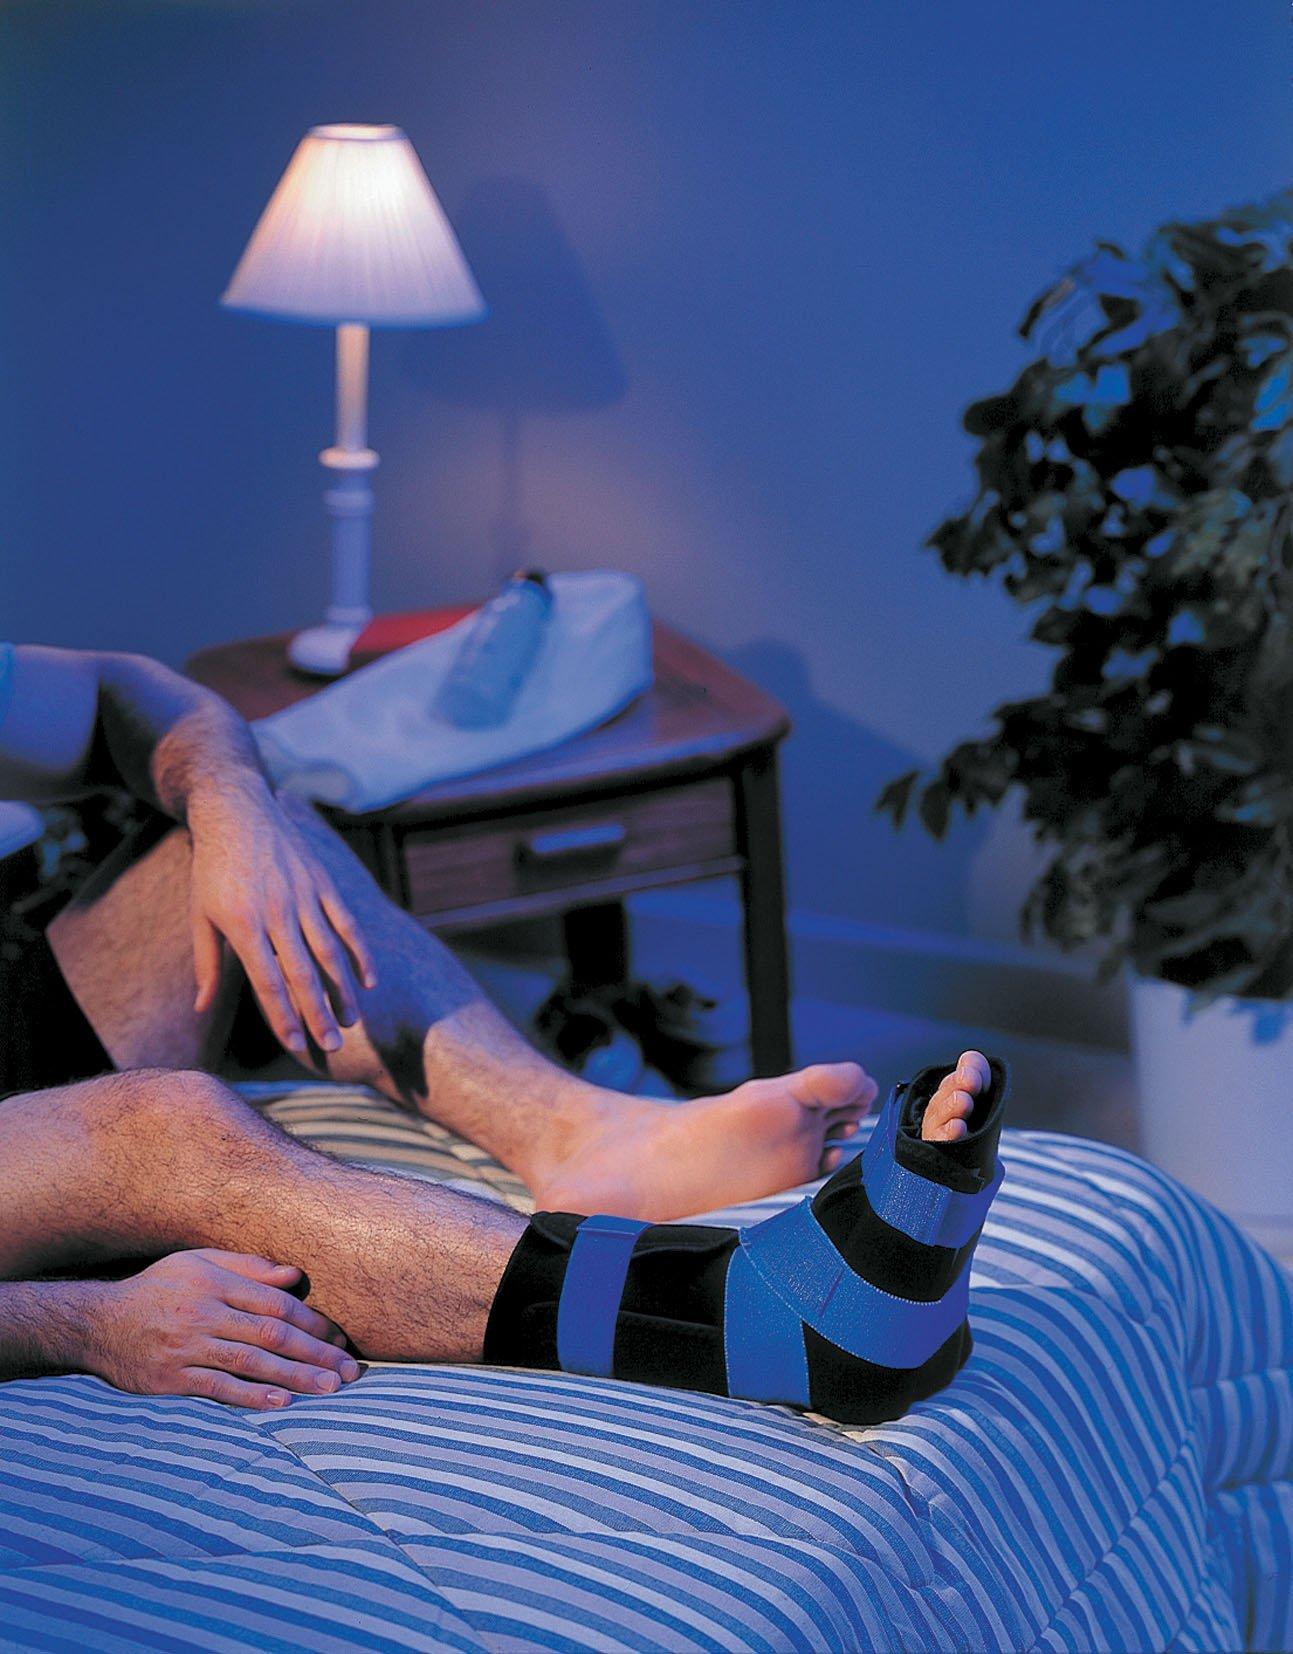 Rolyan Plantar Fasciitis Night Splint - One Size by Patterson Medical